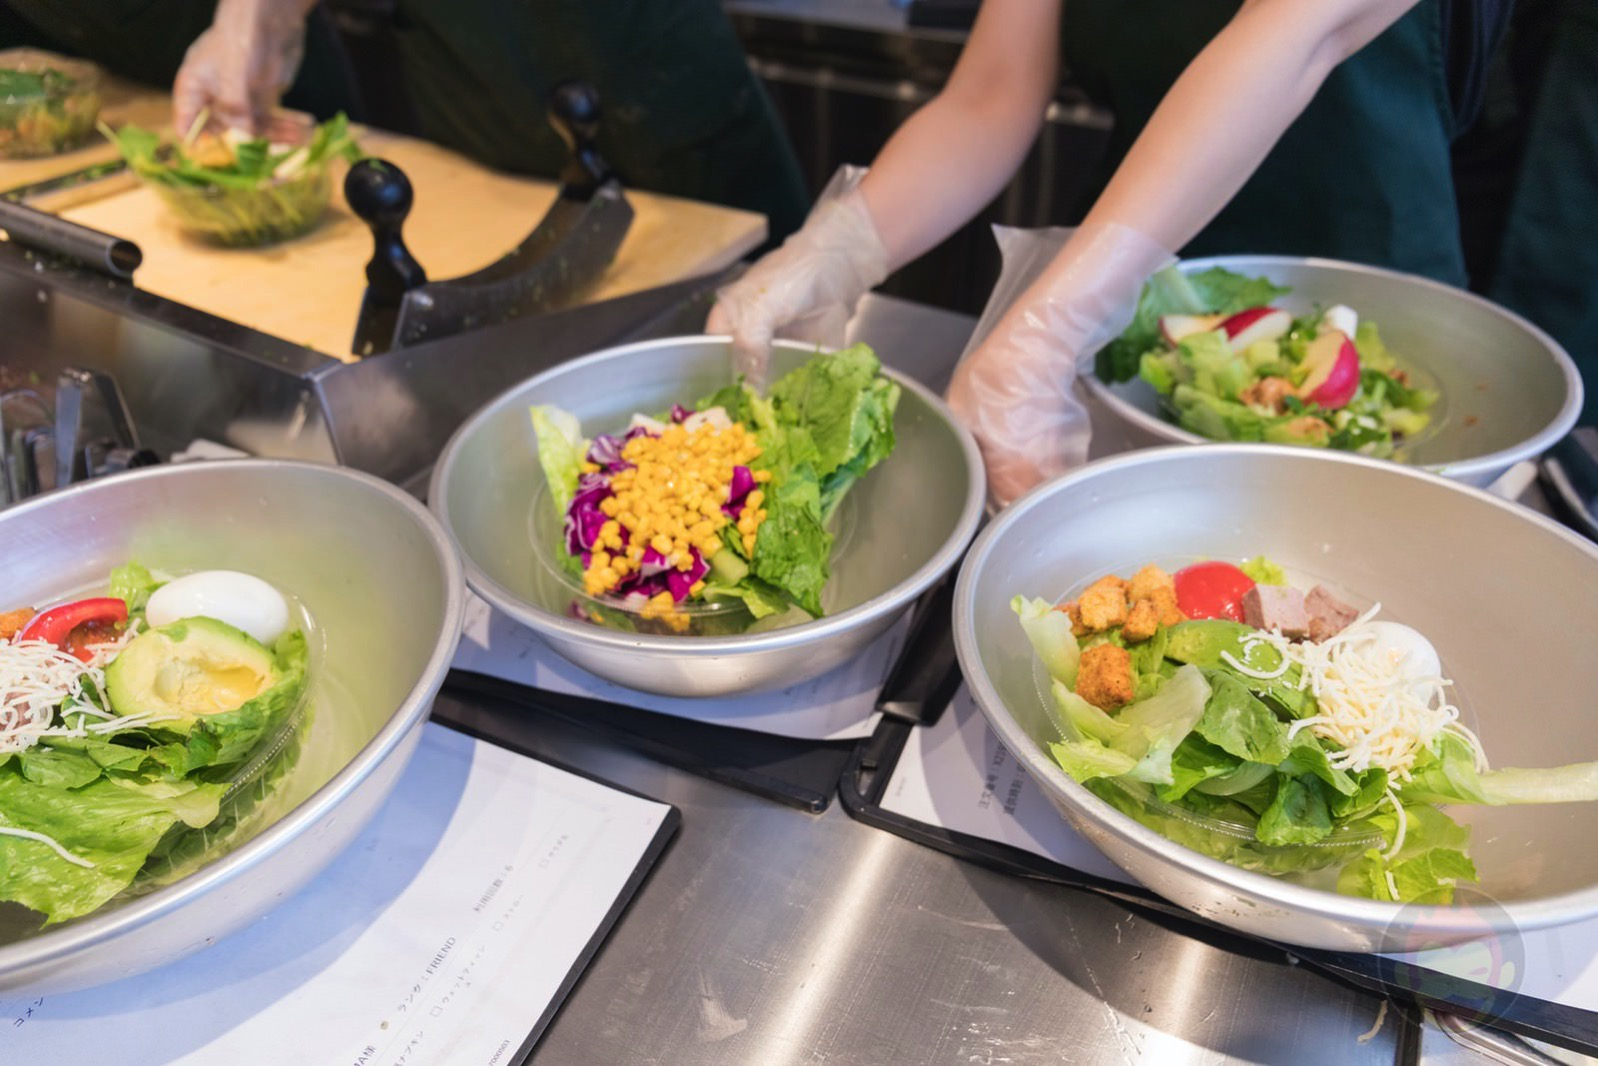 Crips-Salad-Works-Aoyama-06.jpg